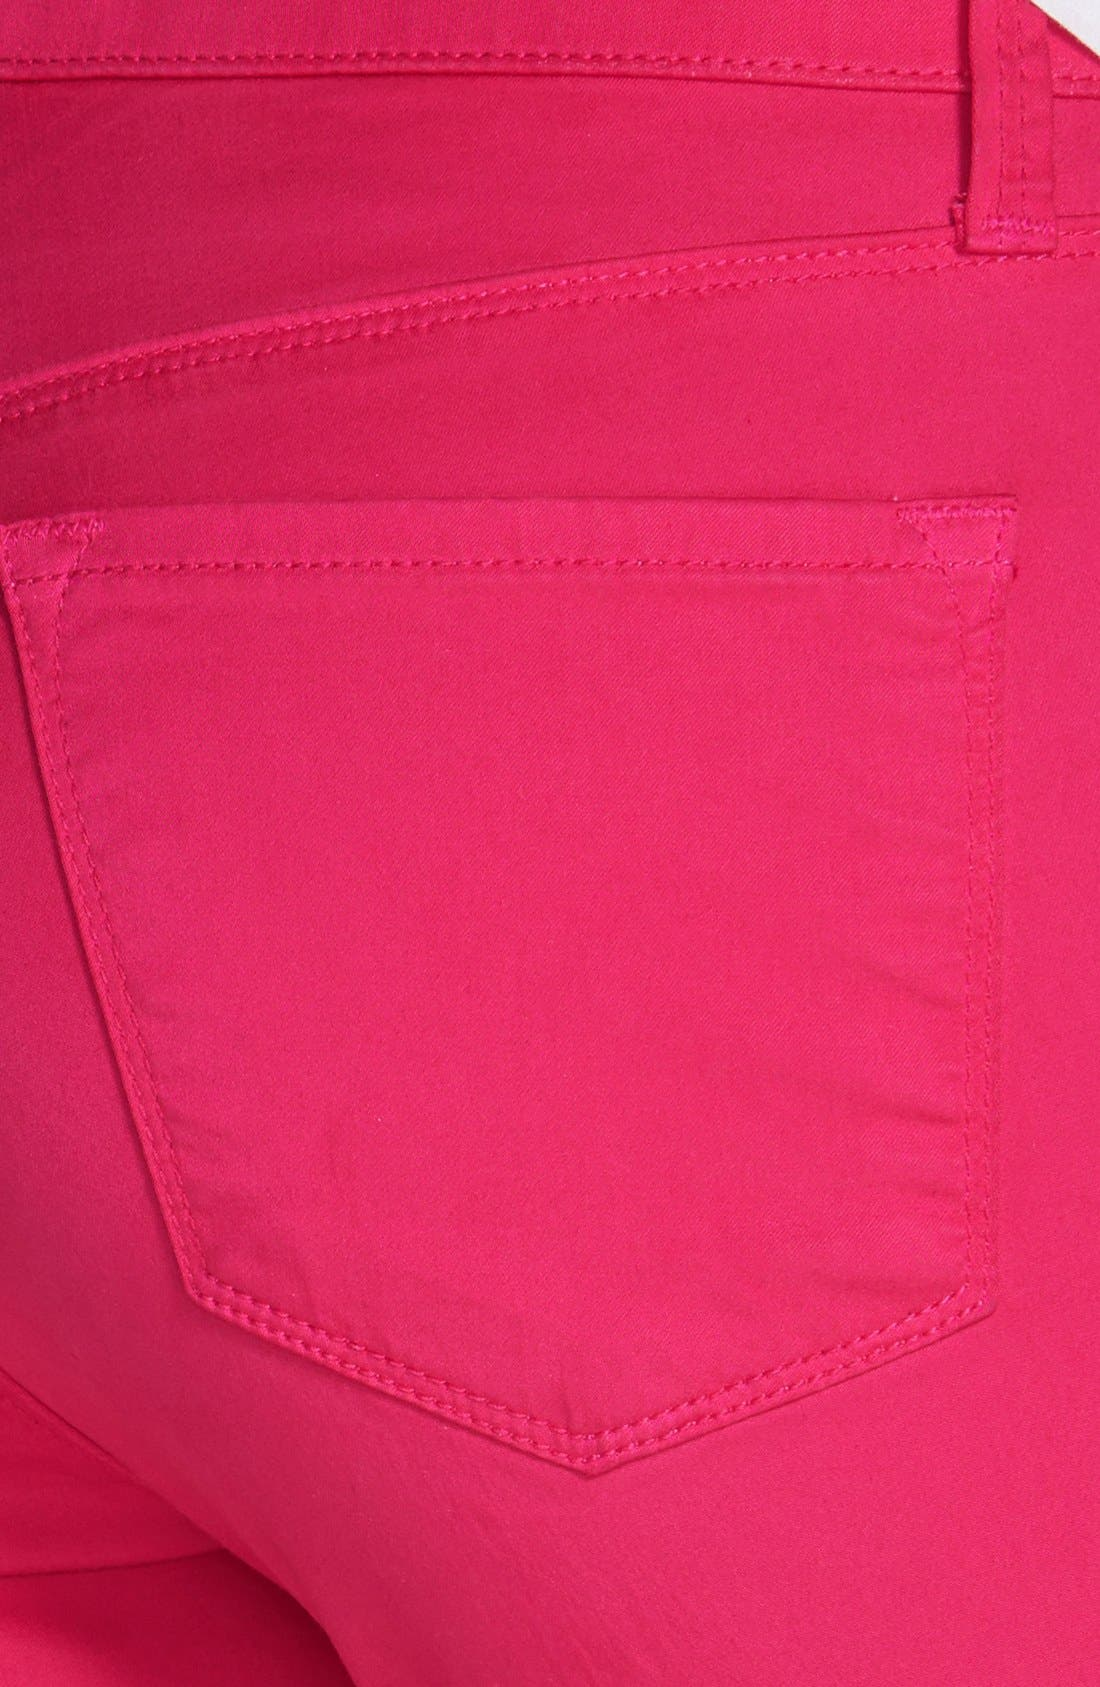 ,                             '485' Mid Rise Super Skinny Jeans,                             Alternate thumbnail 59, color,                             671